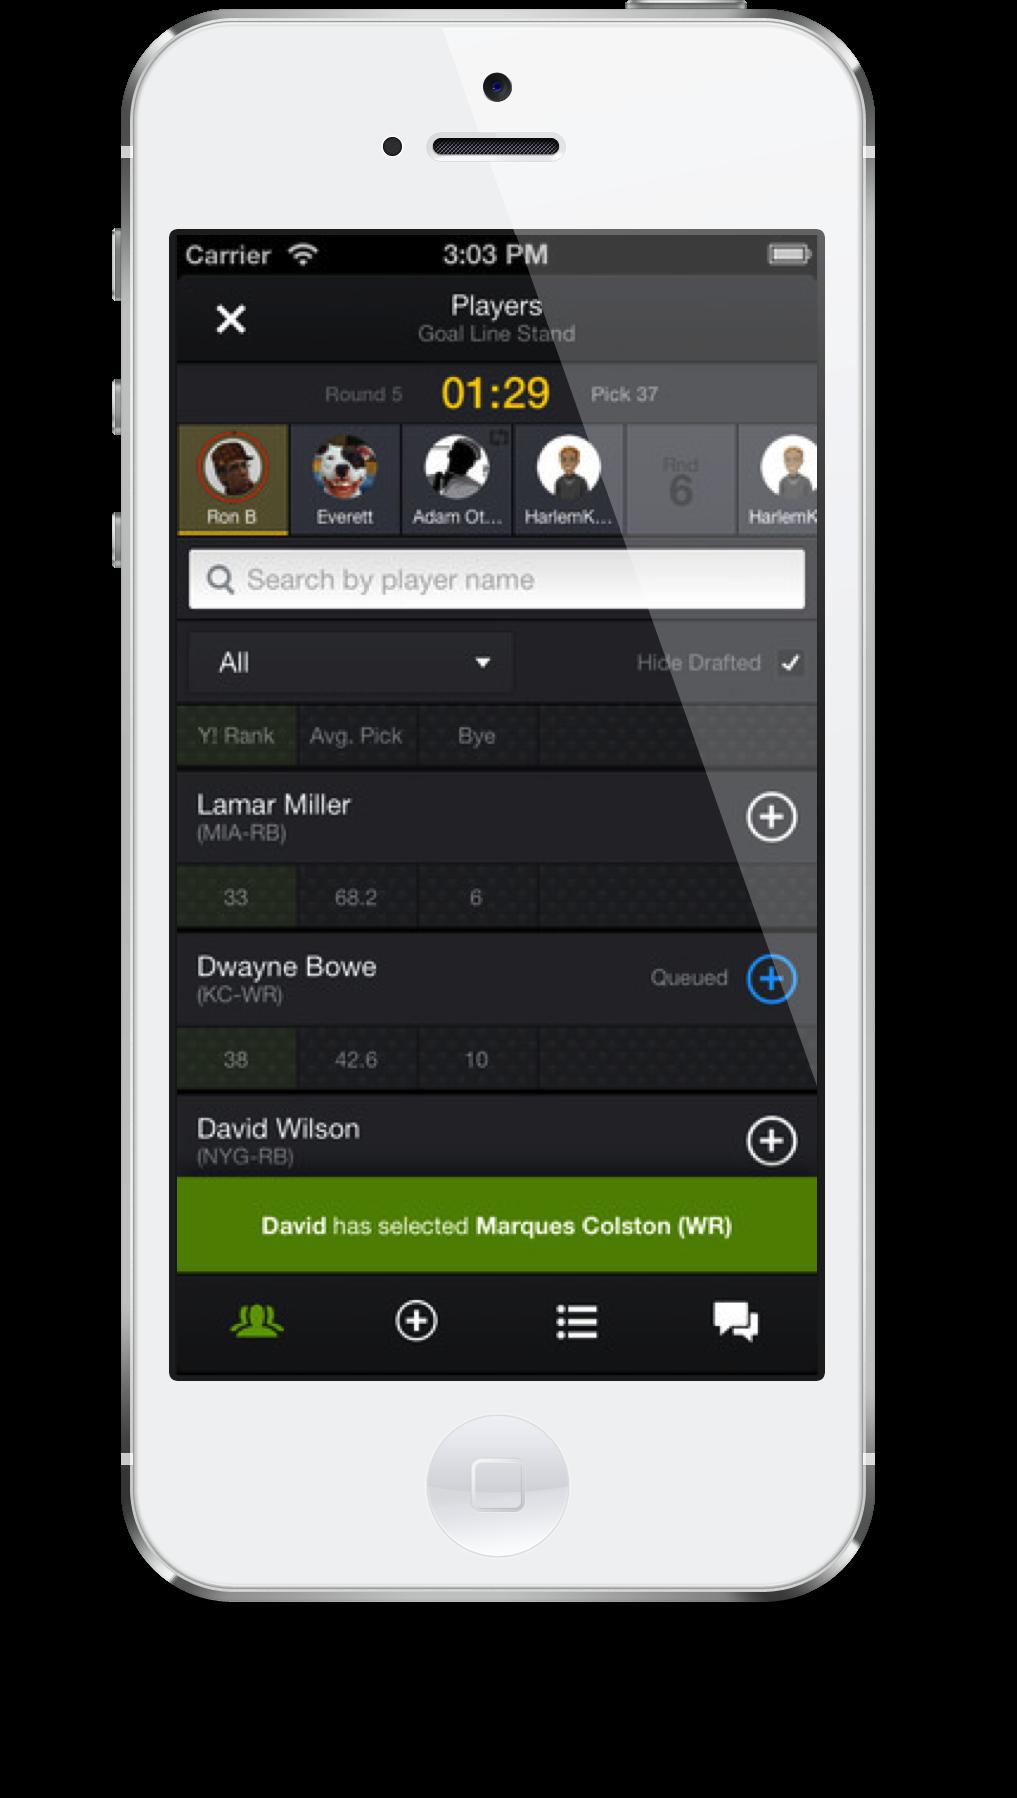 The Yahoo! Fantasy Sports - Football App Launches For 2013 NFL Season